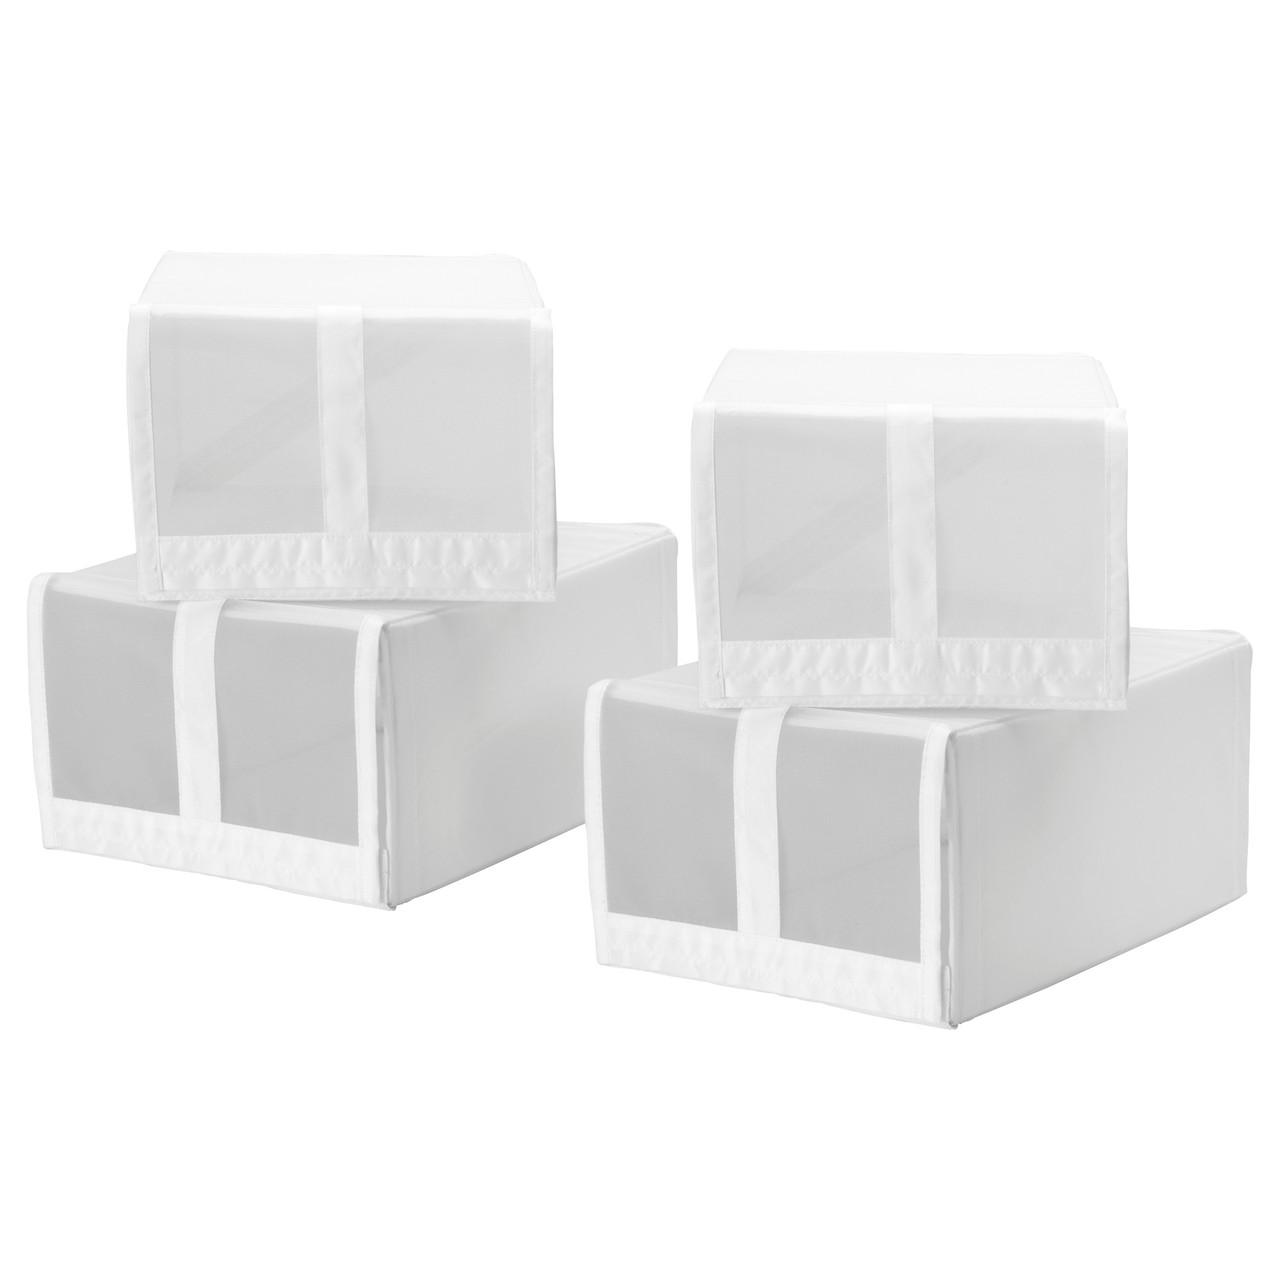 SKUBB Коробка для обуви, белый 901.863.91